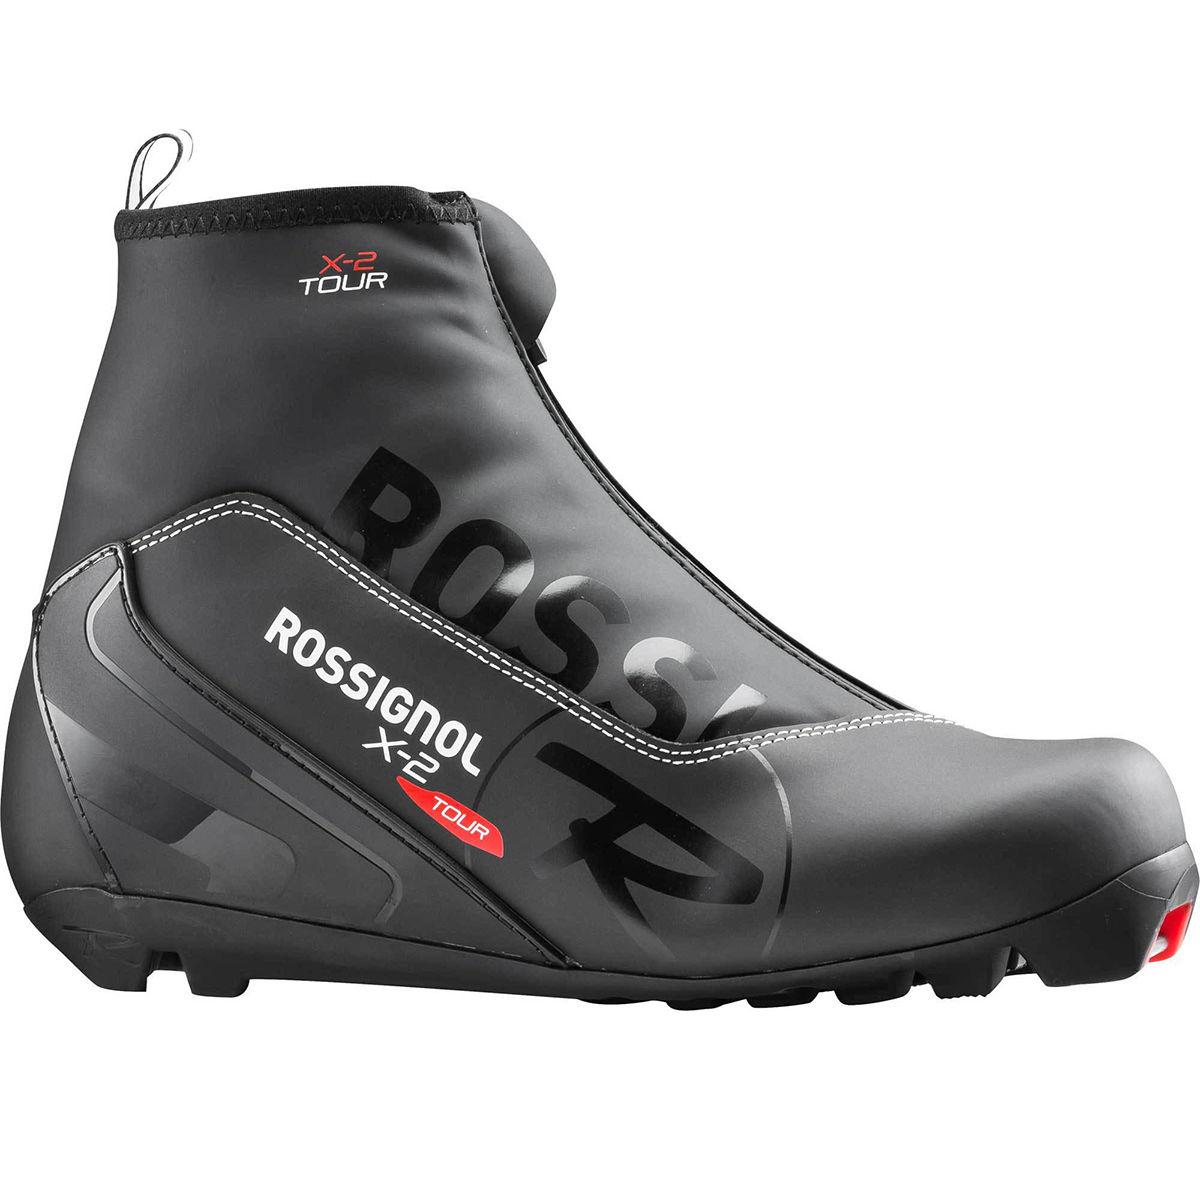 photo: Rossignol X-2 nordic touring boot